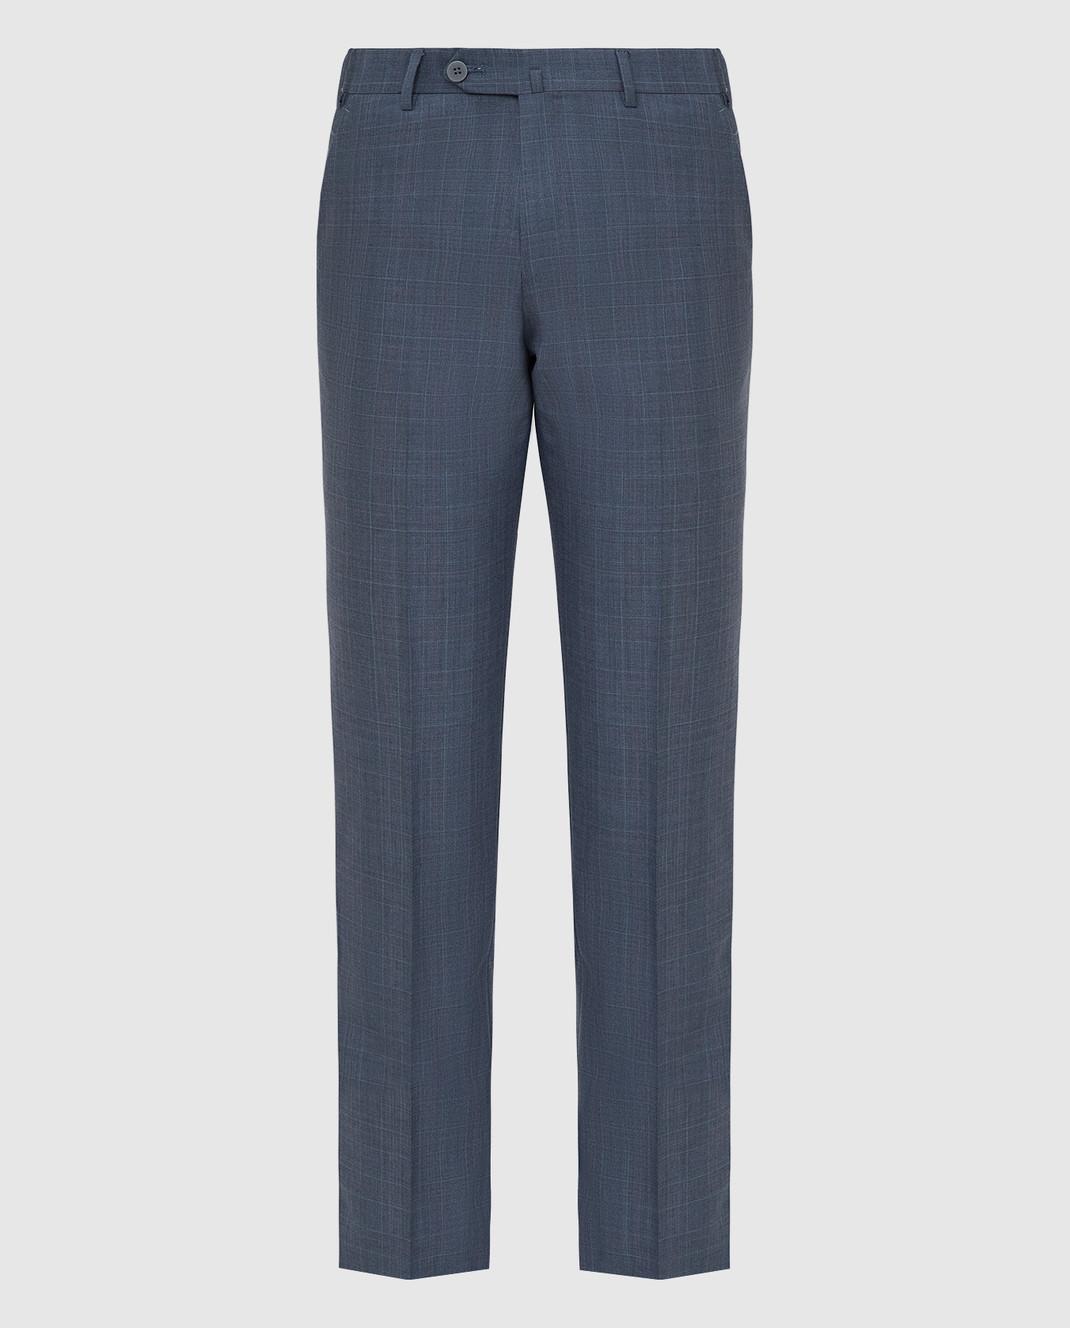 ISAIA Синие брюки из шерсти 0073153629F